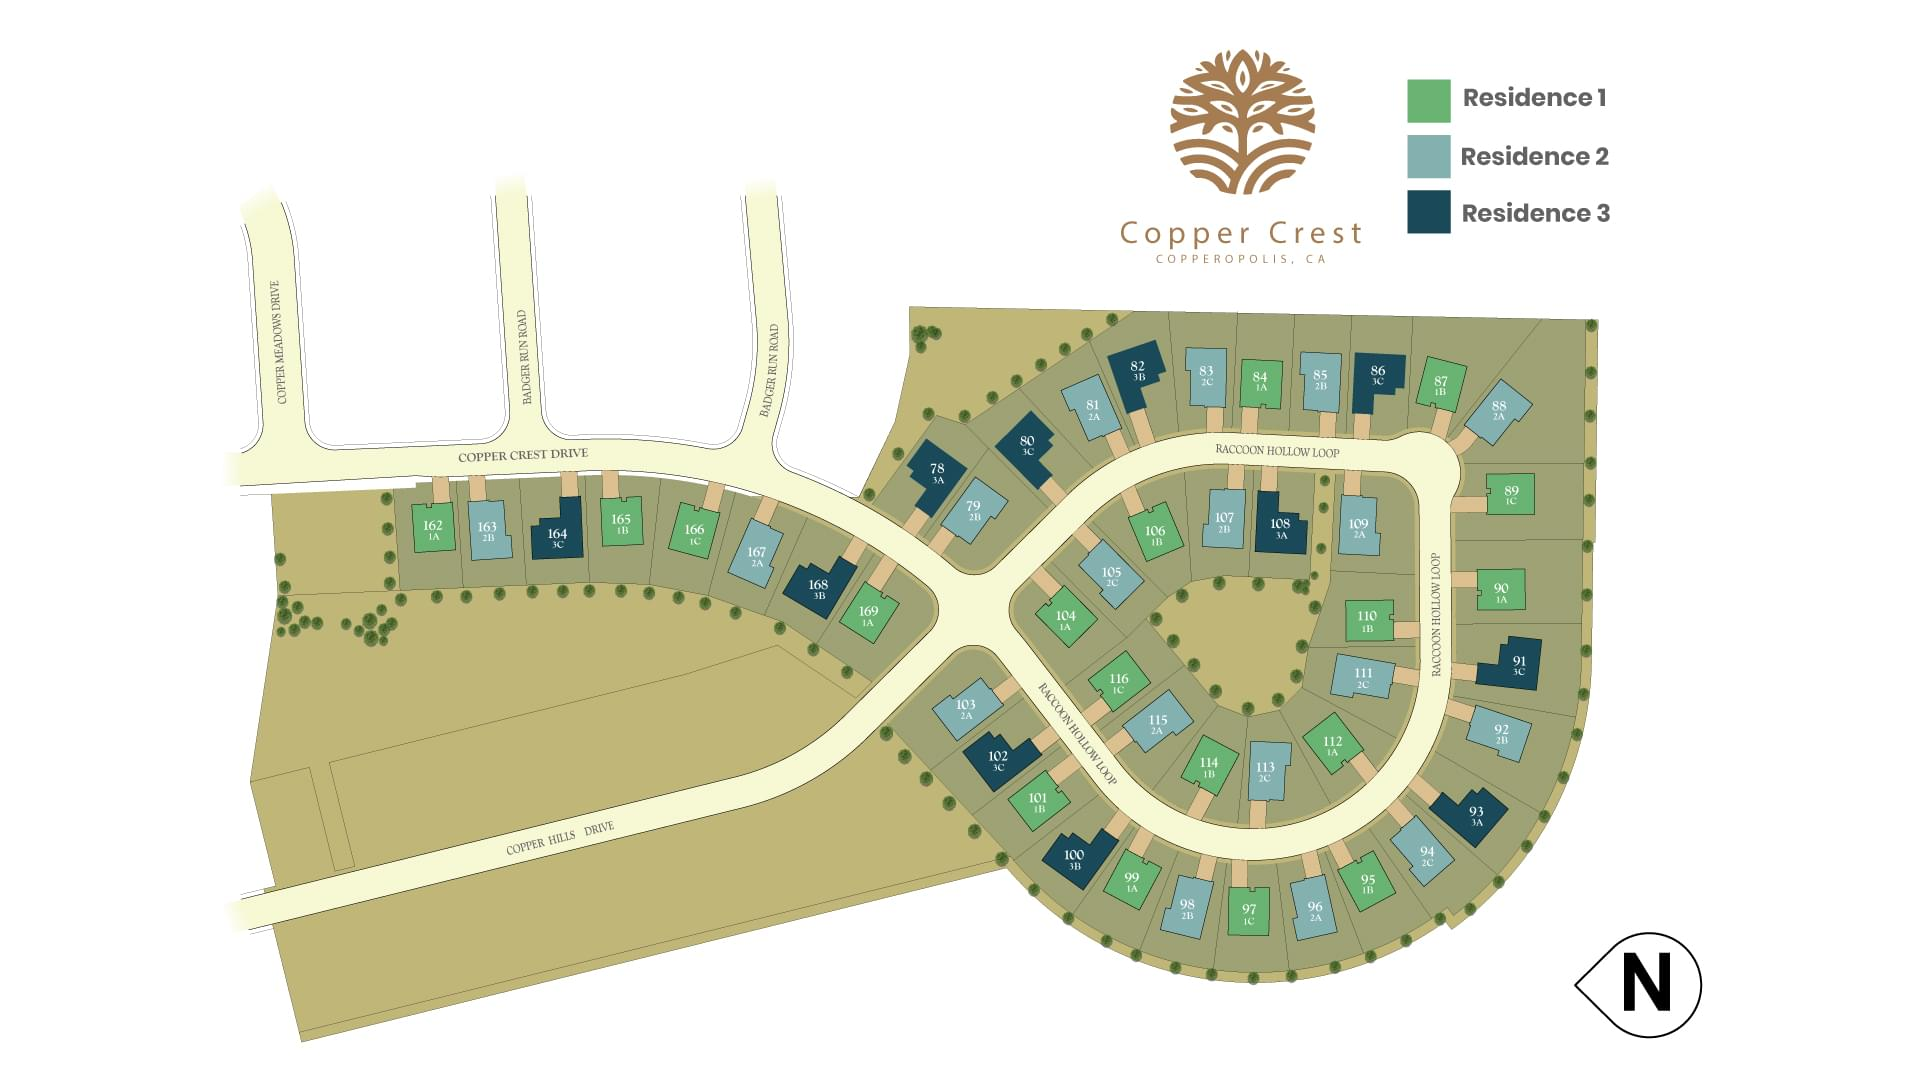 Copper Crest New Homes in Copperopolis, CA